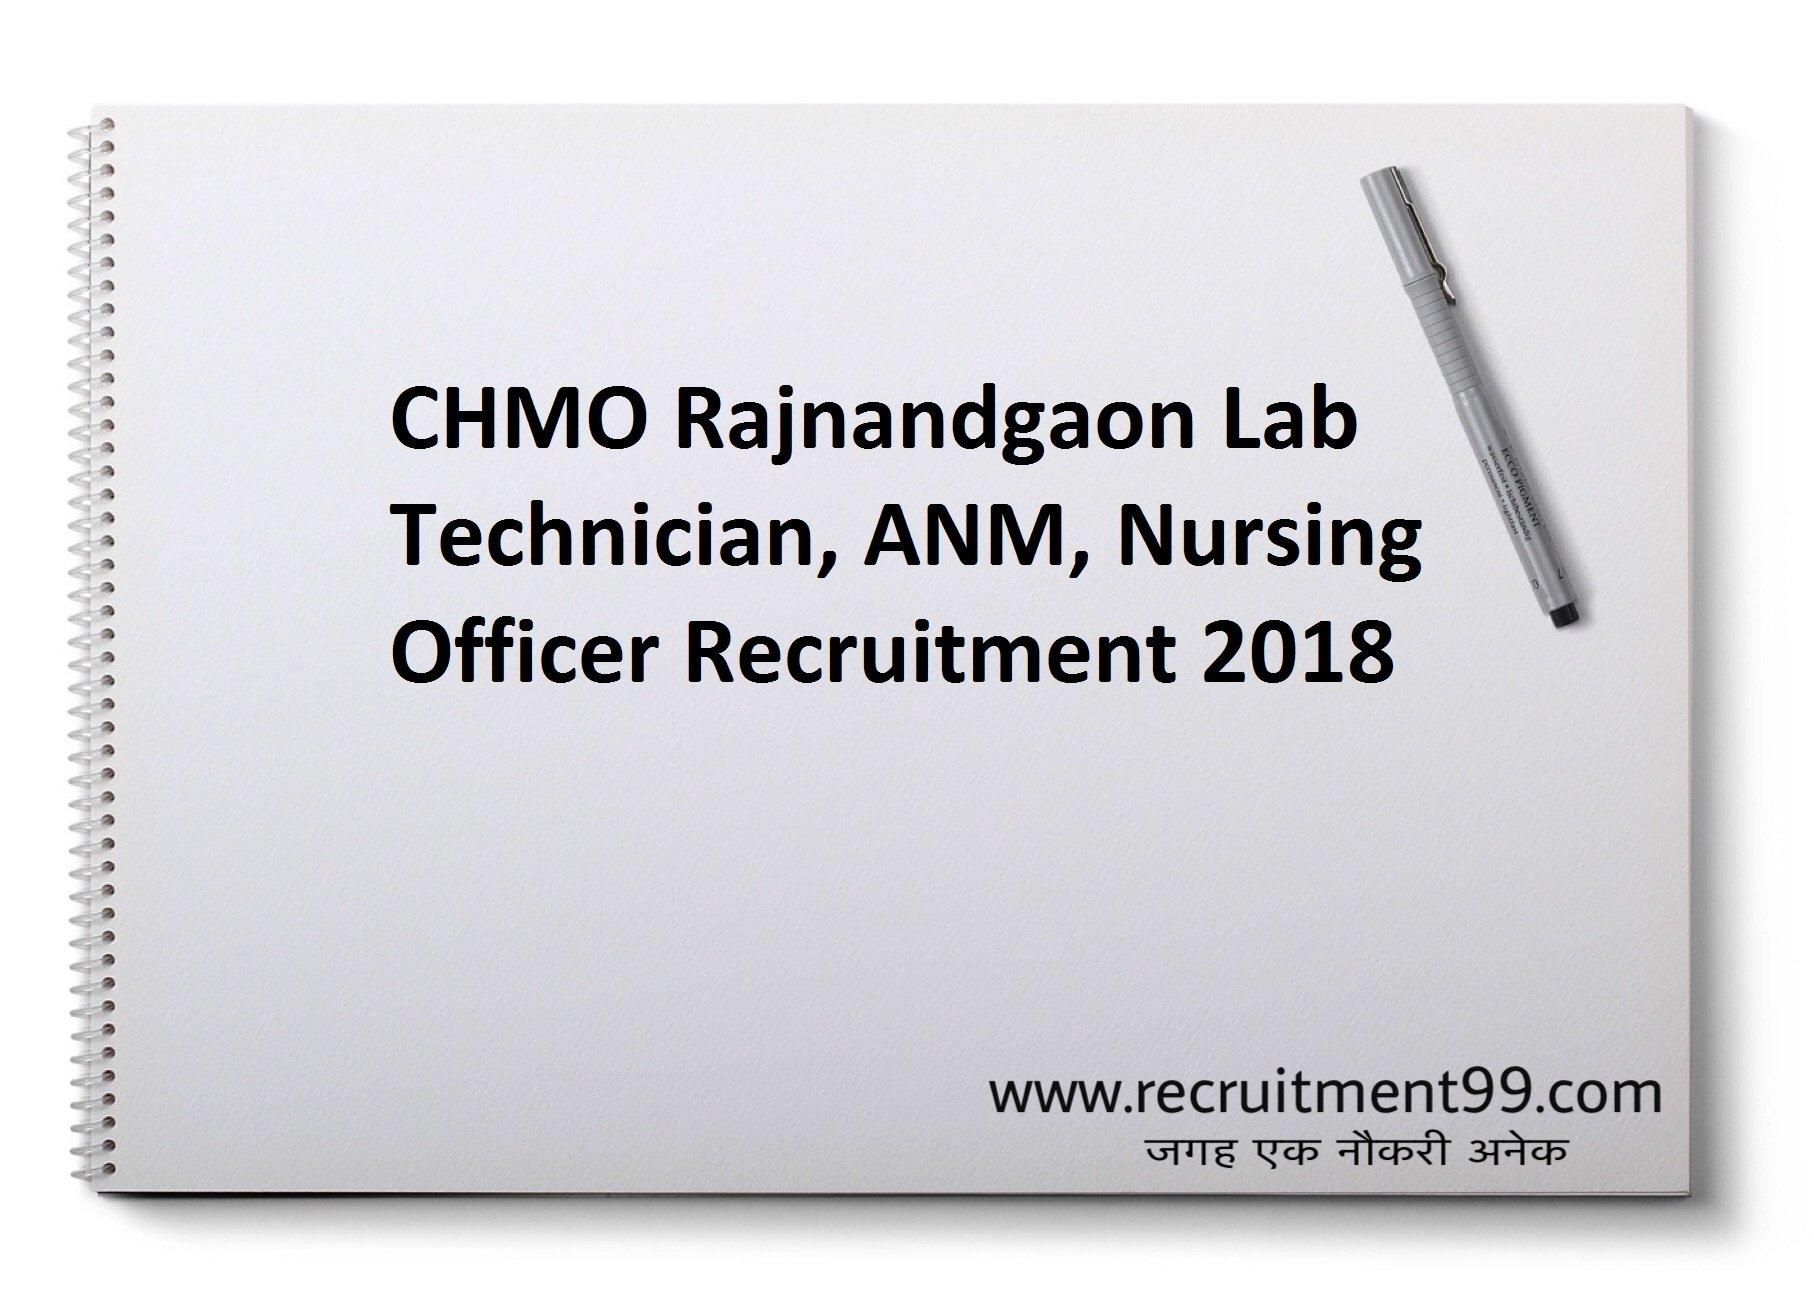 CHMO Rajnandgaon Lab Technician, ANM, Nursing Officer Recruitment Admit Card Result 2018